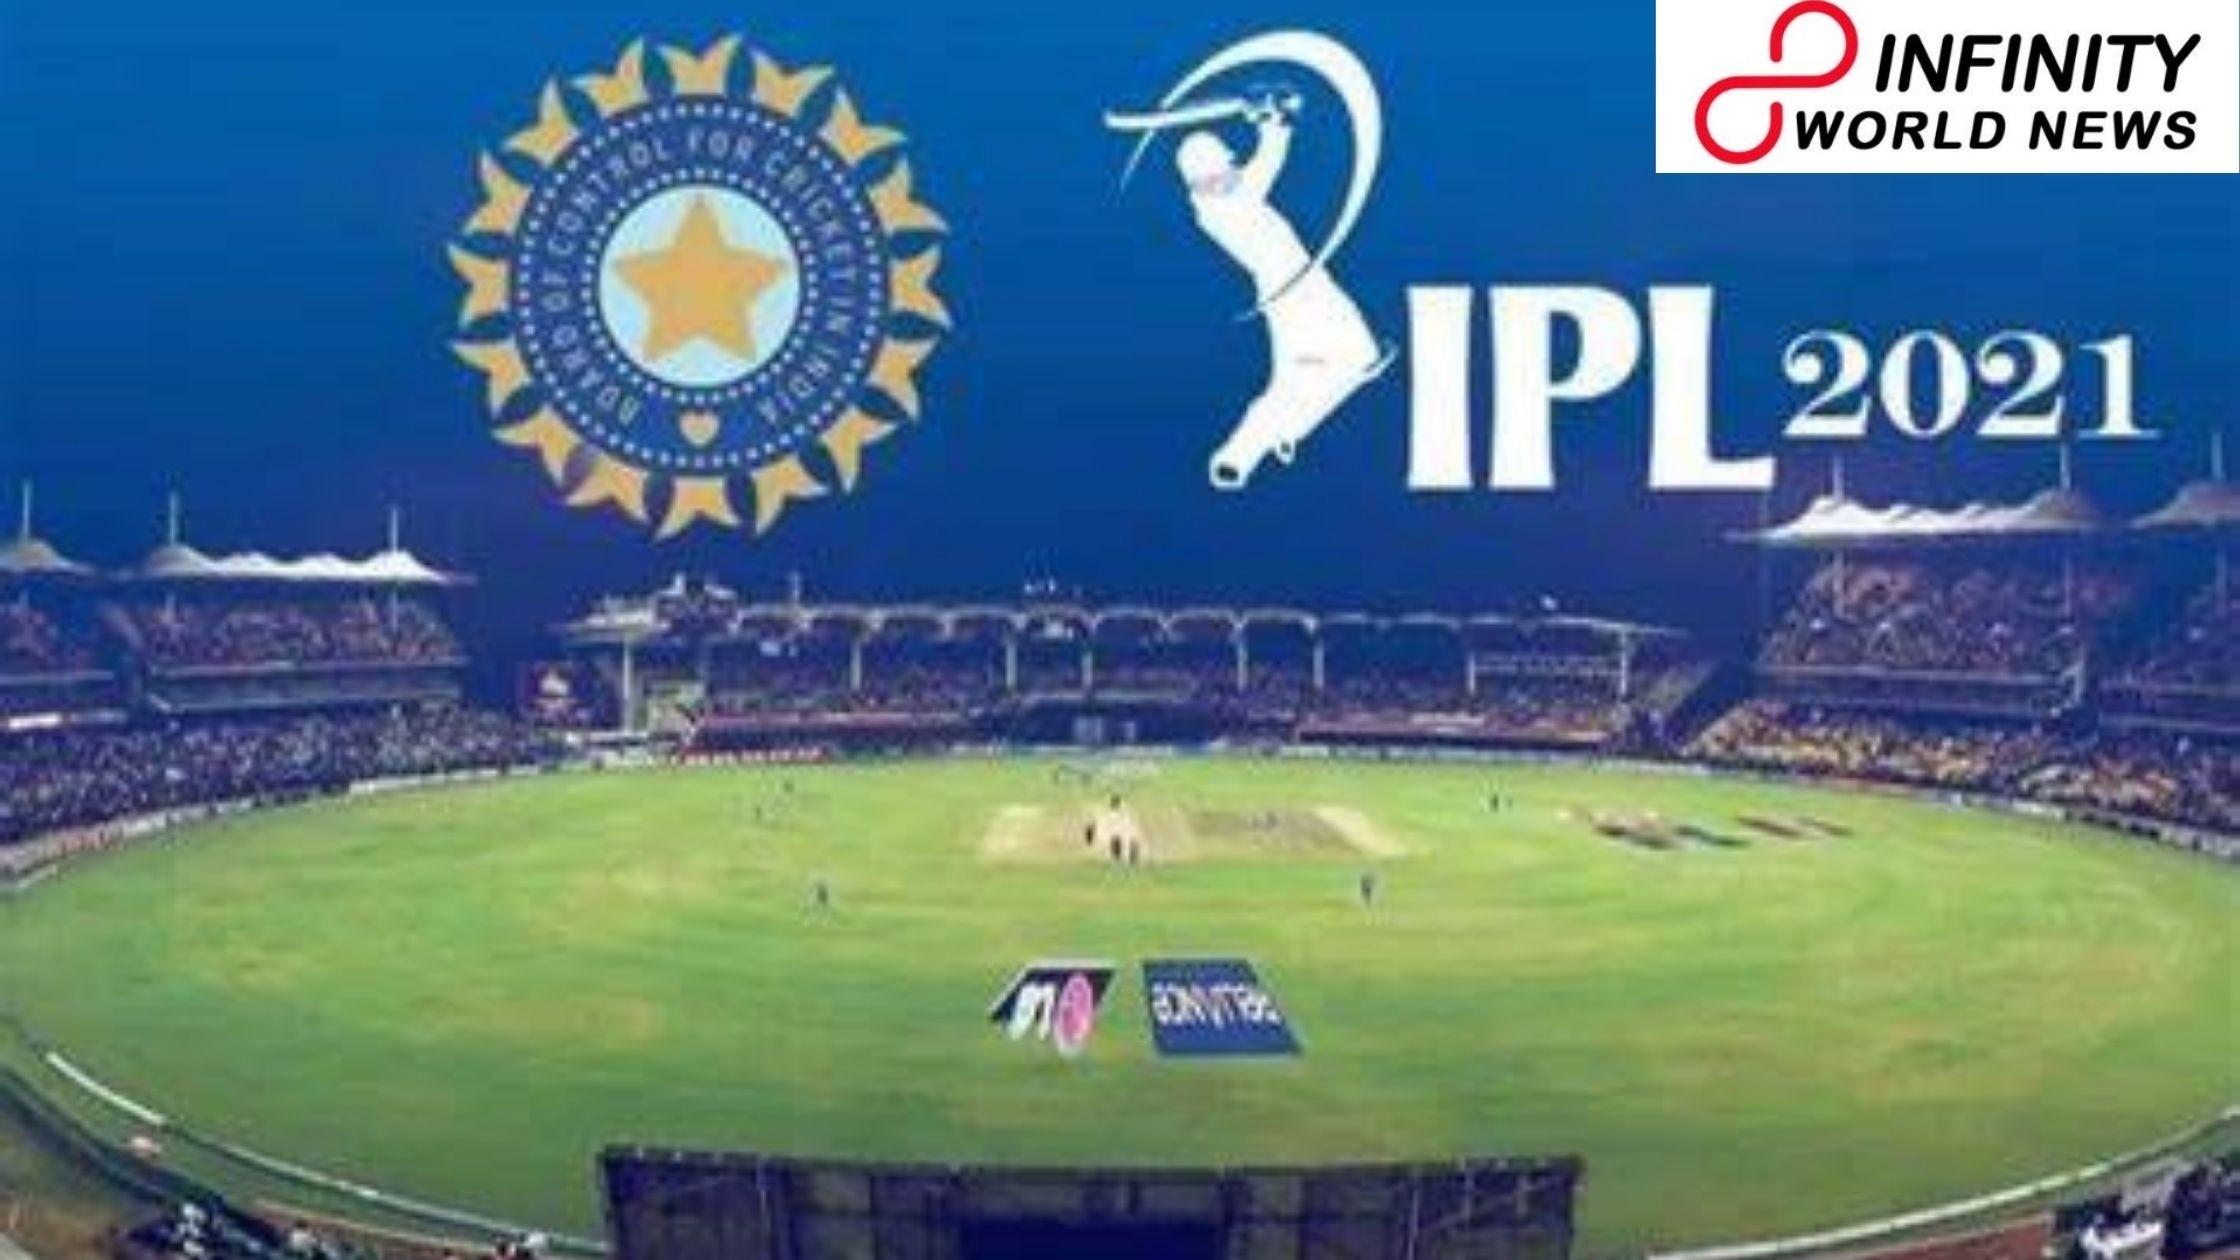 IPL 2021: Reliance Jio Unveils Special Plans